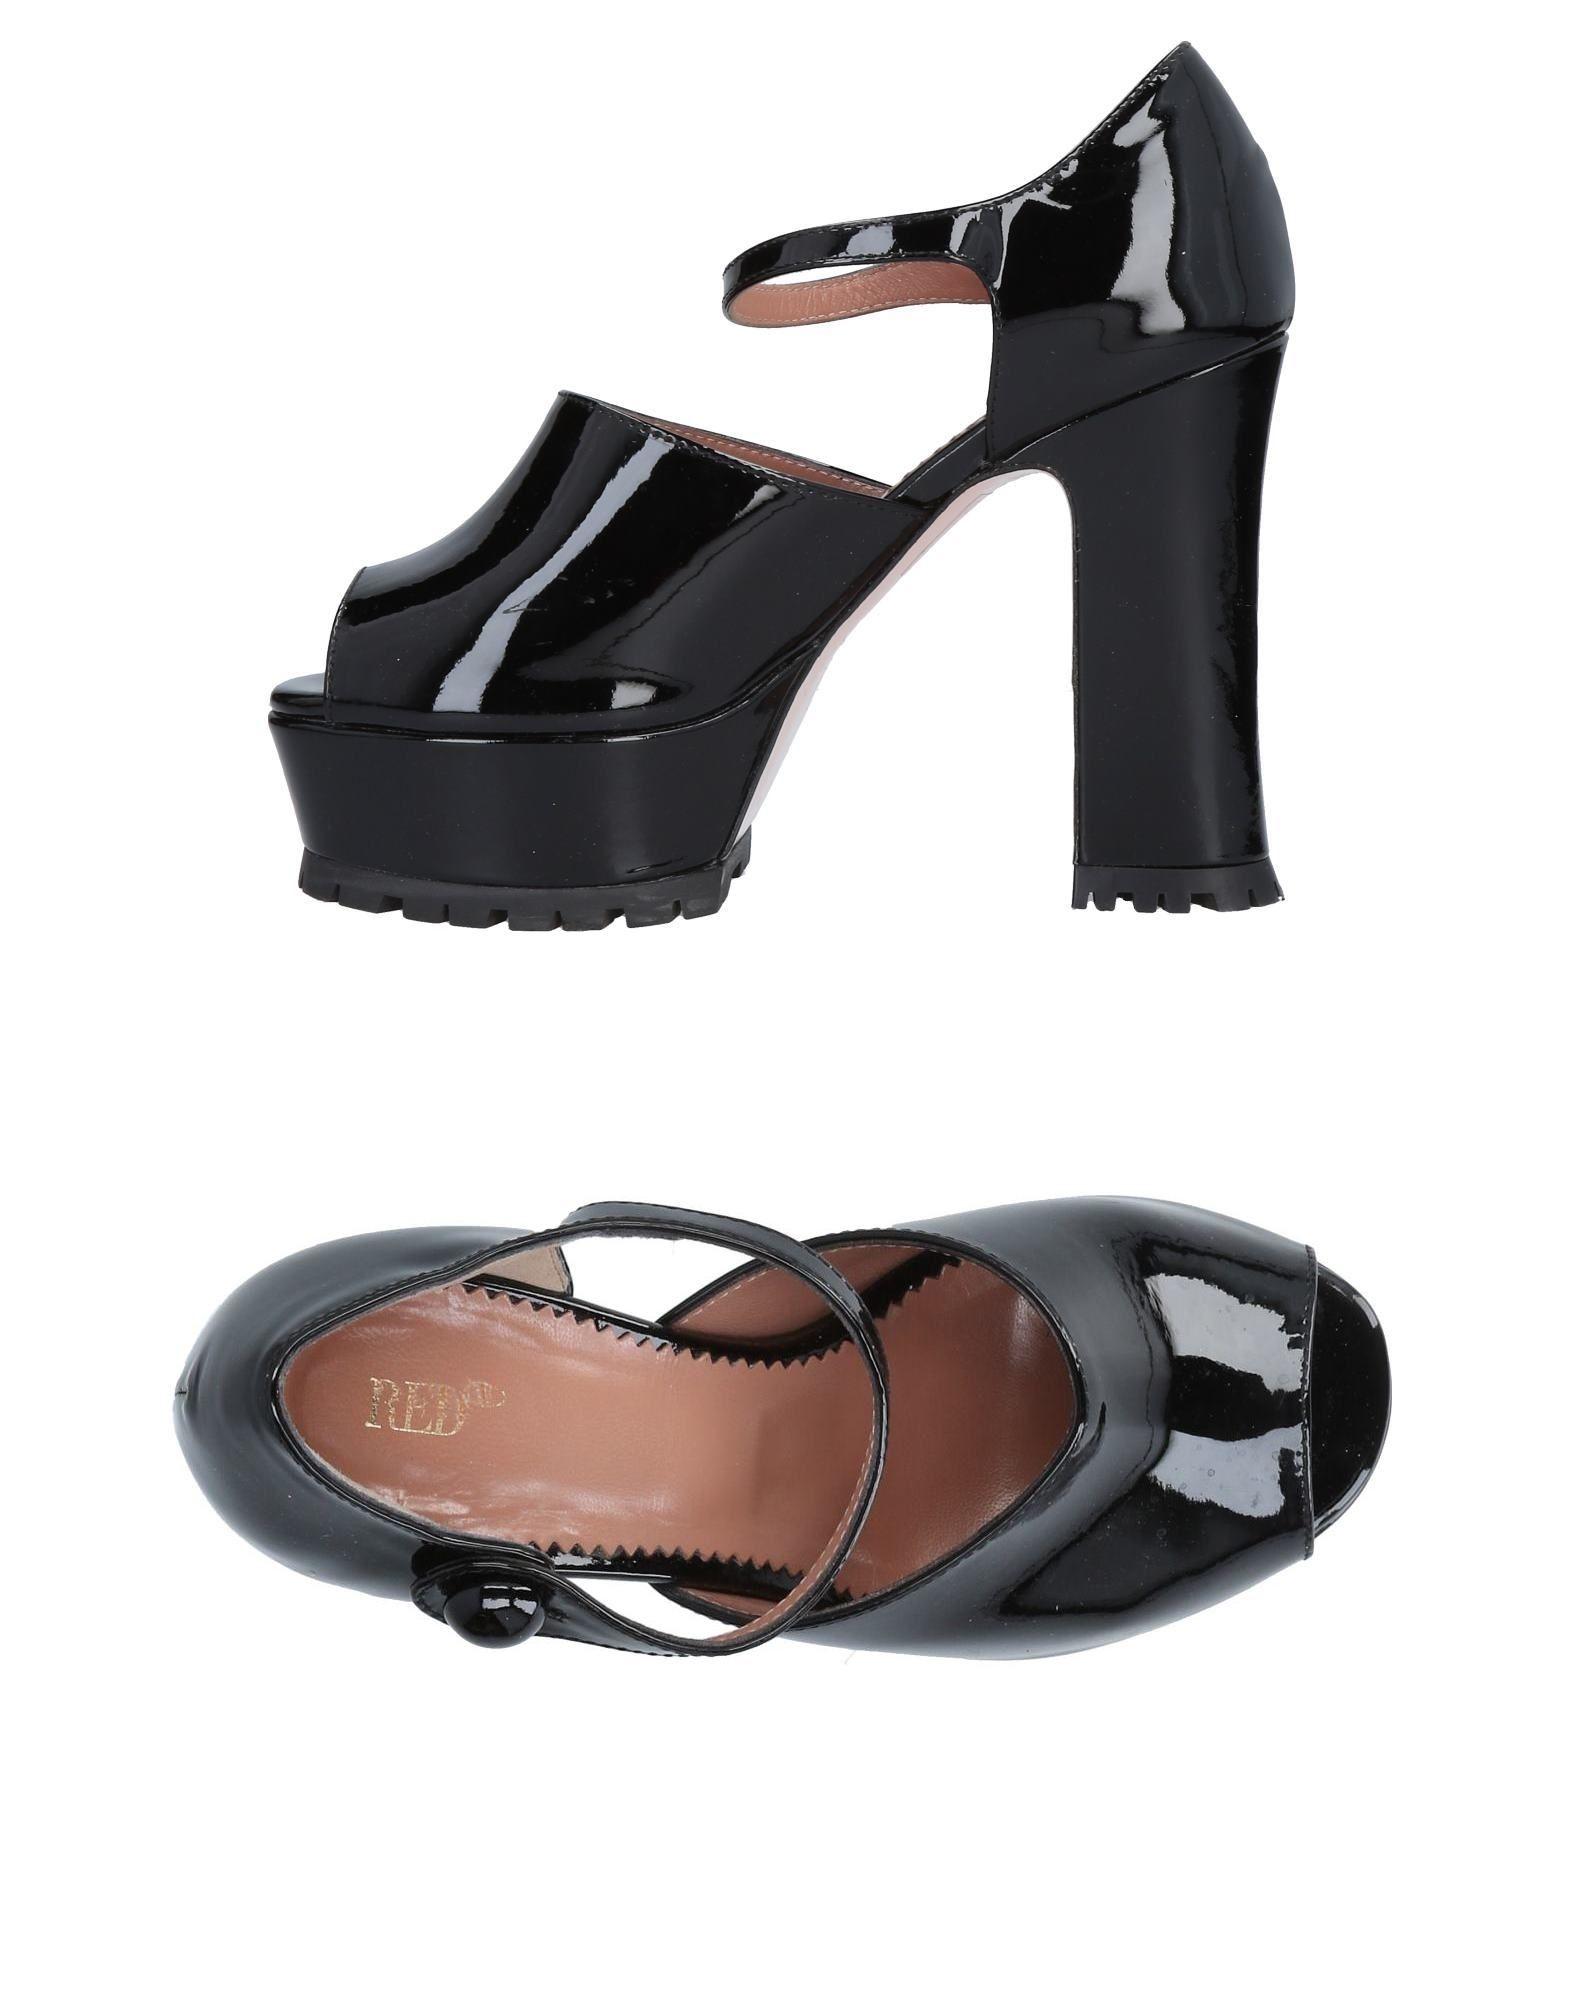 Stilvolle billige Sandalen Schuhe ROT(V) Sandalen billige Damen  11475619II 8f0a8d